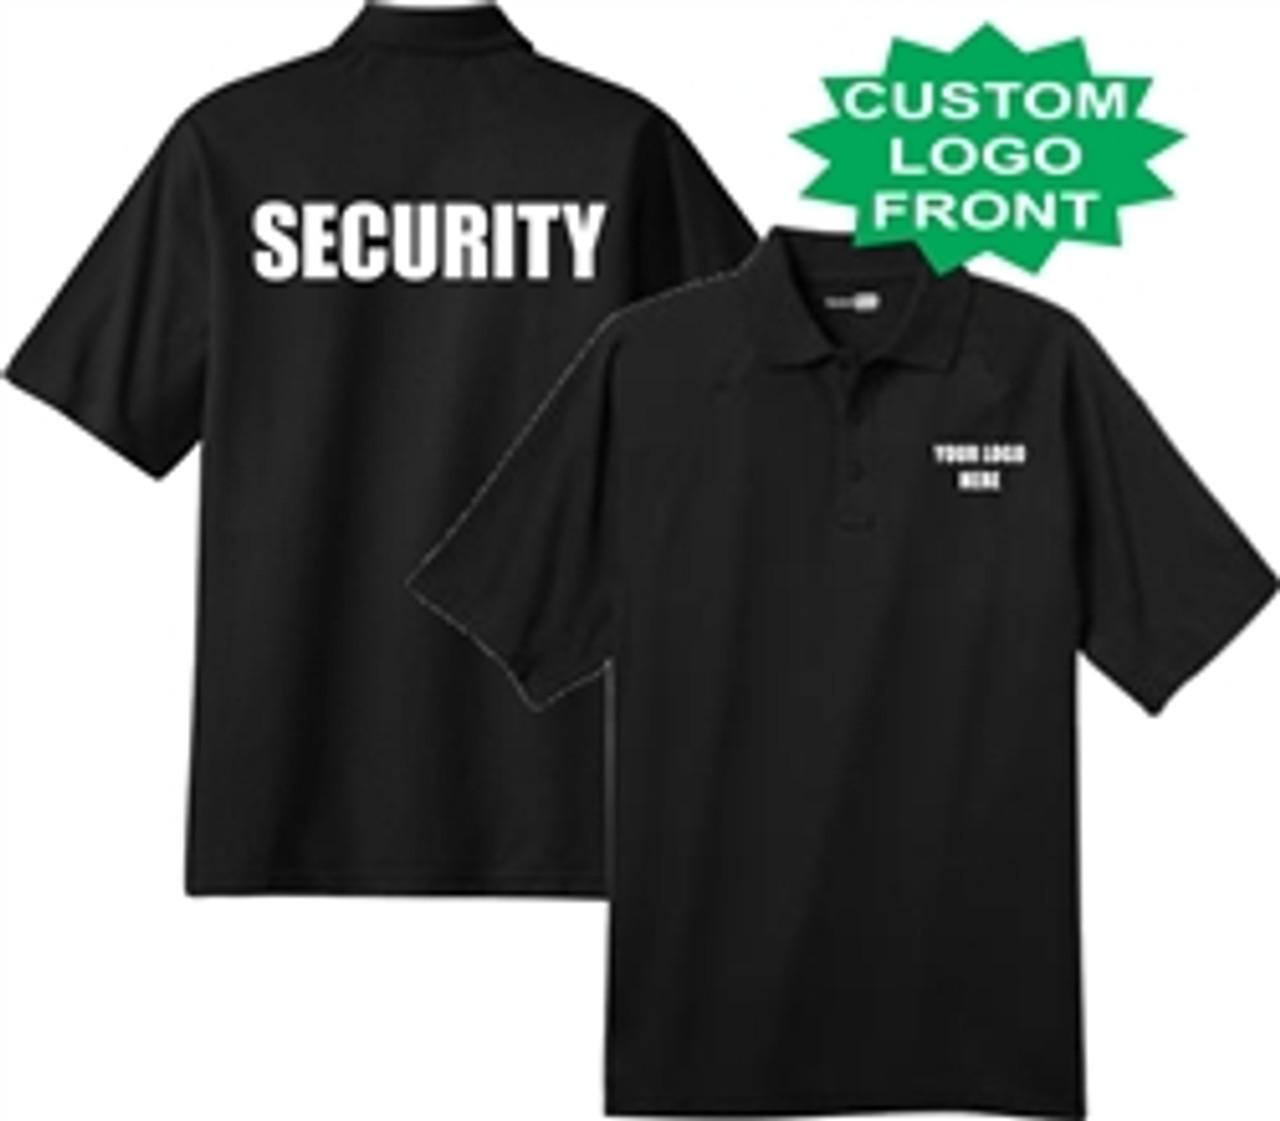 Security - Customized Black Short Sleeve Tactical Polo